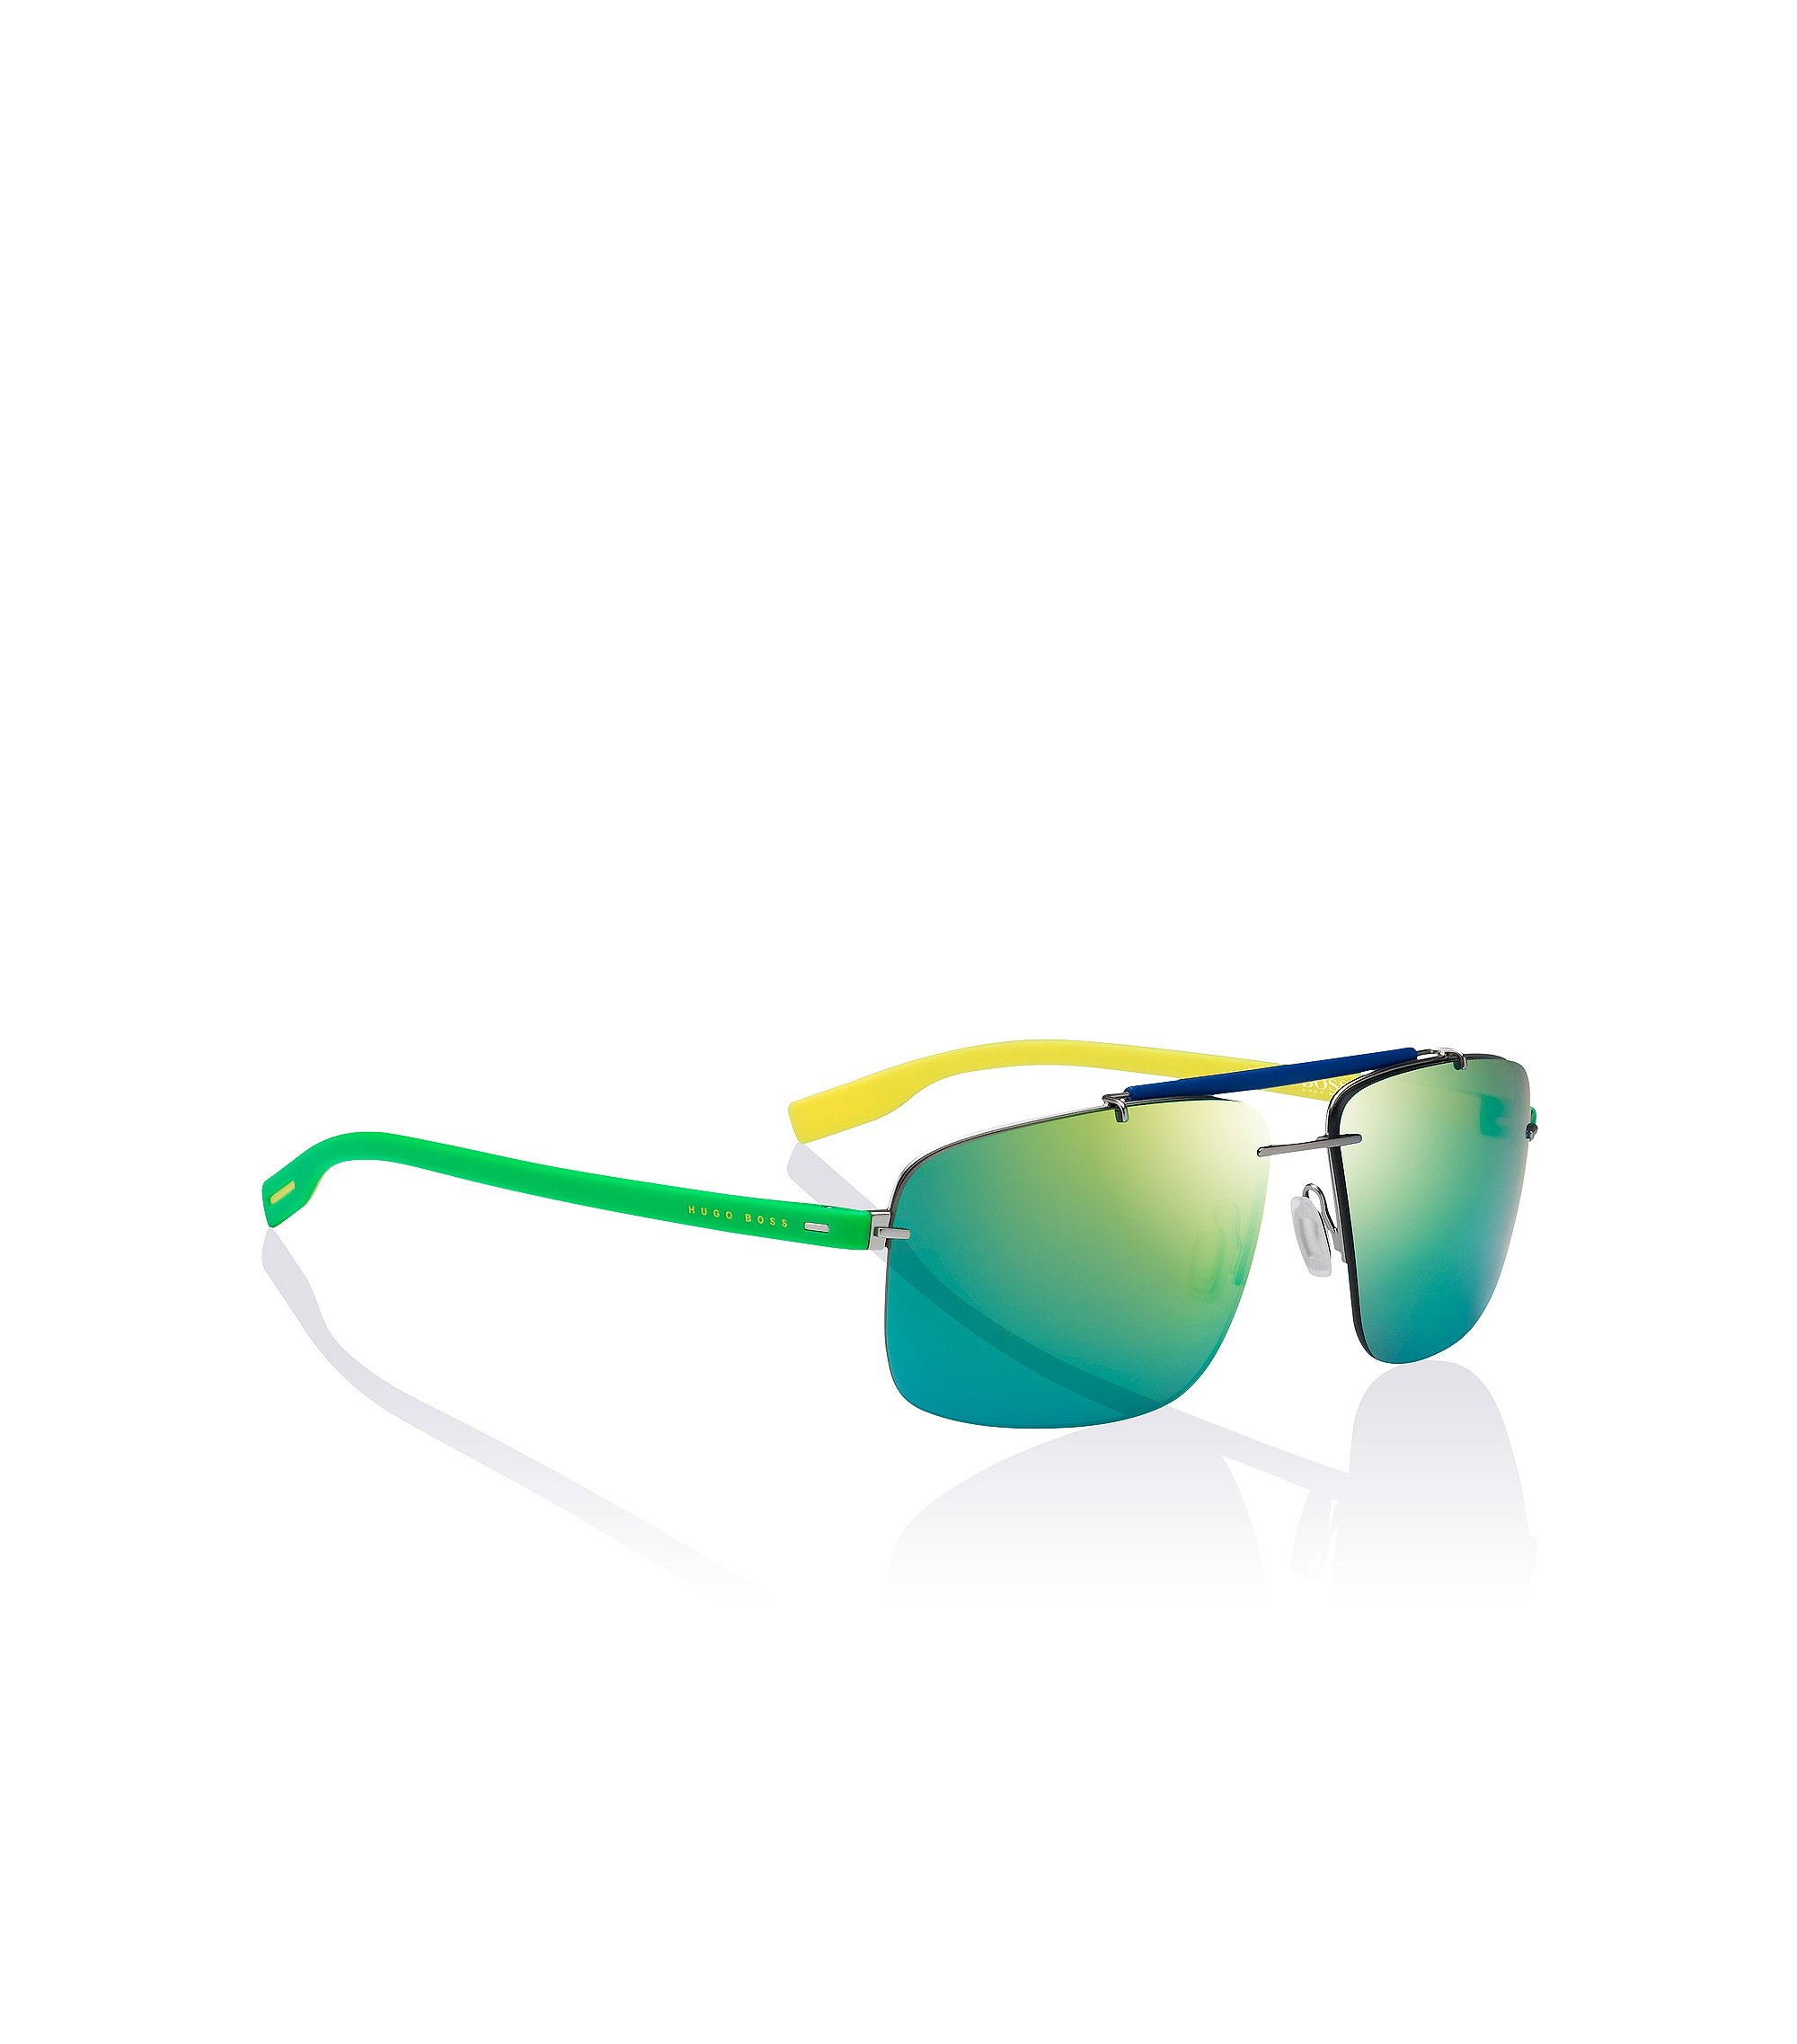 Sonnenbrille ´BOSS 0608/S`, Länderkollektion, Assorted-Pre-Pack